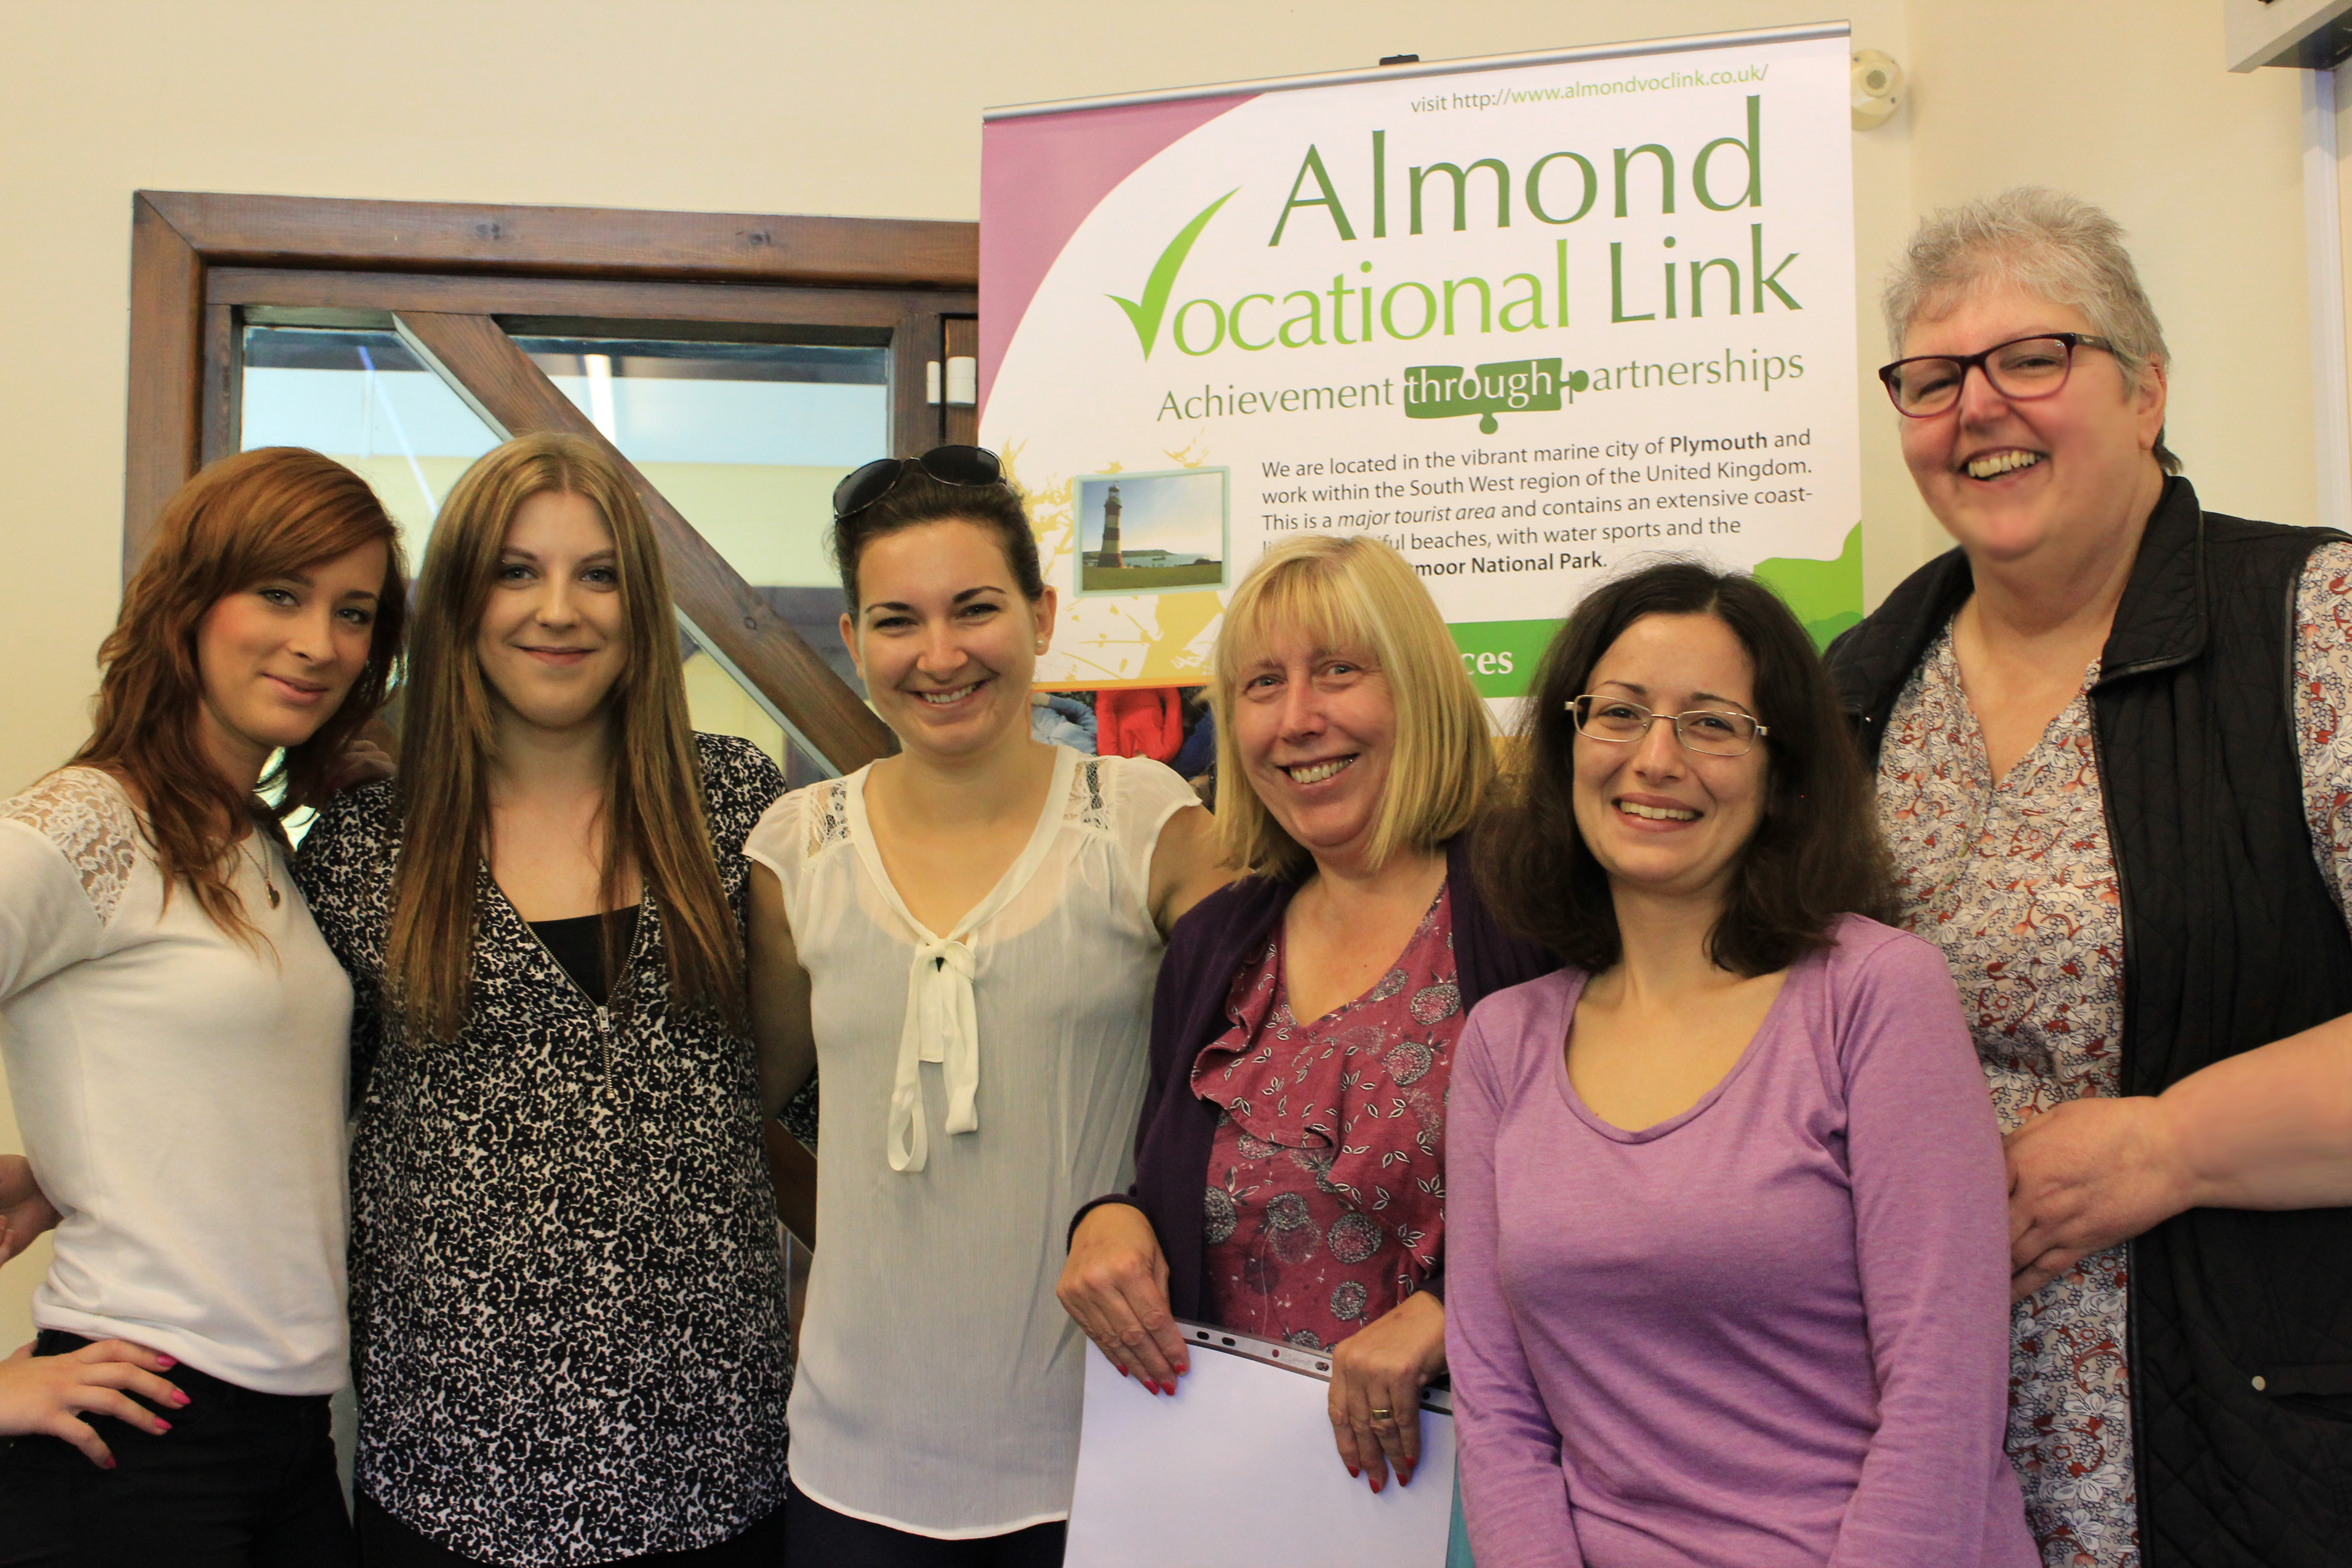 Group photo Almond Plymouth UK